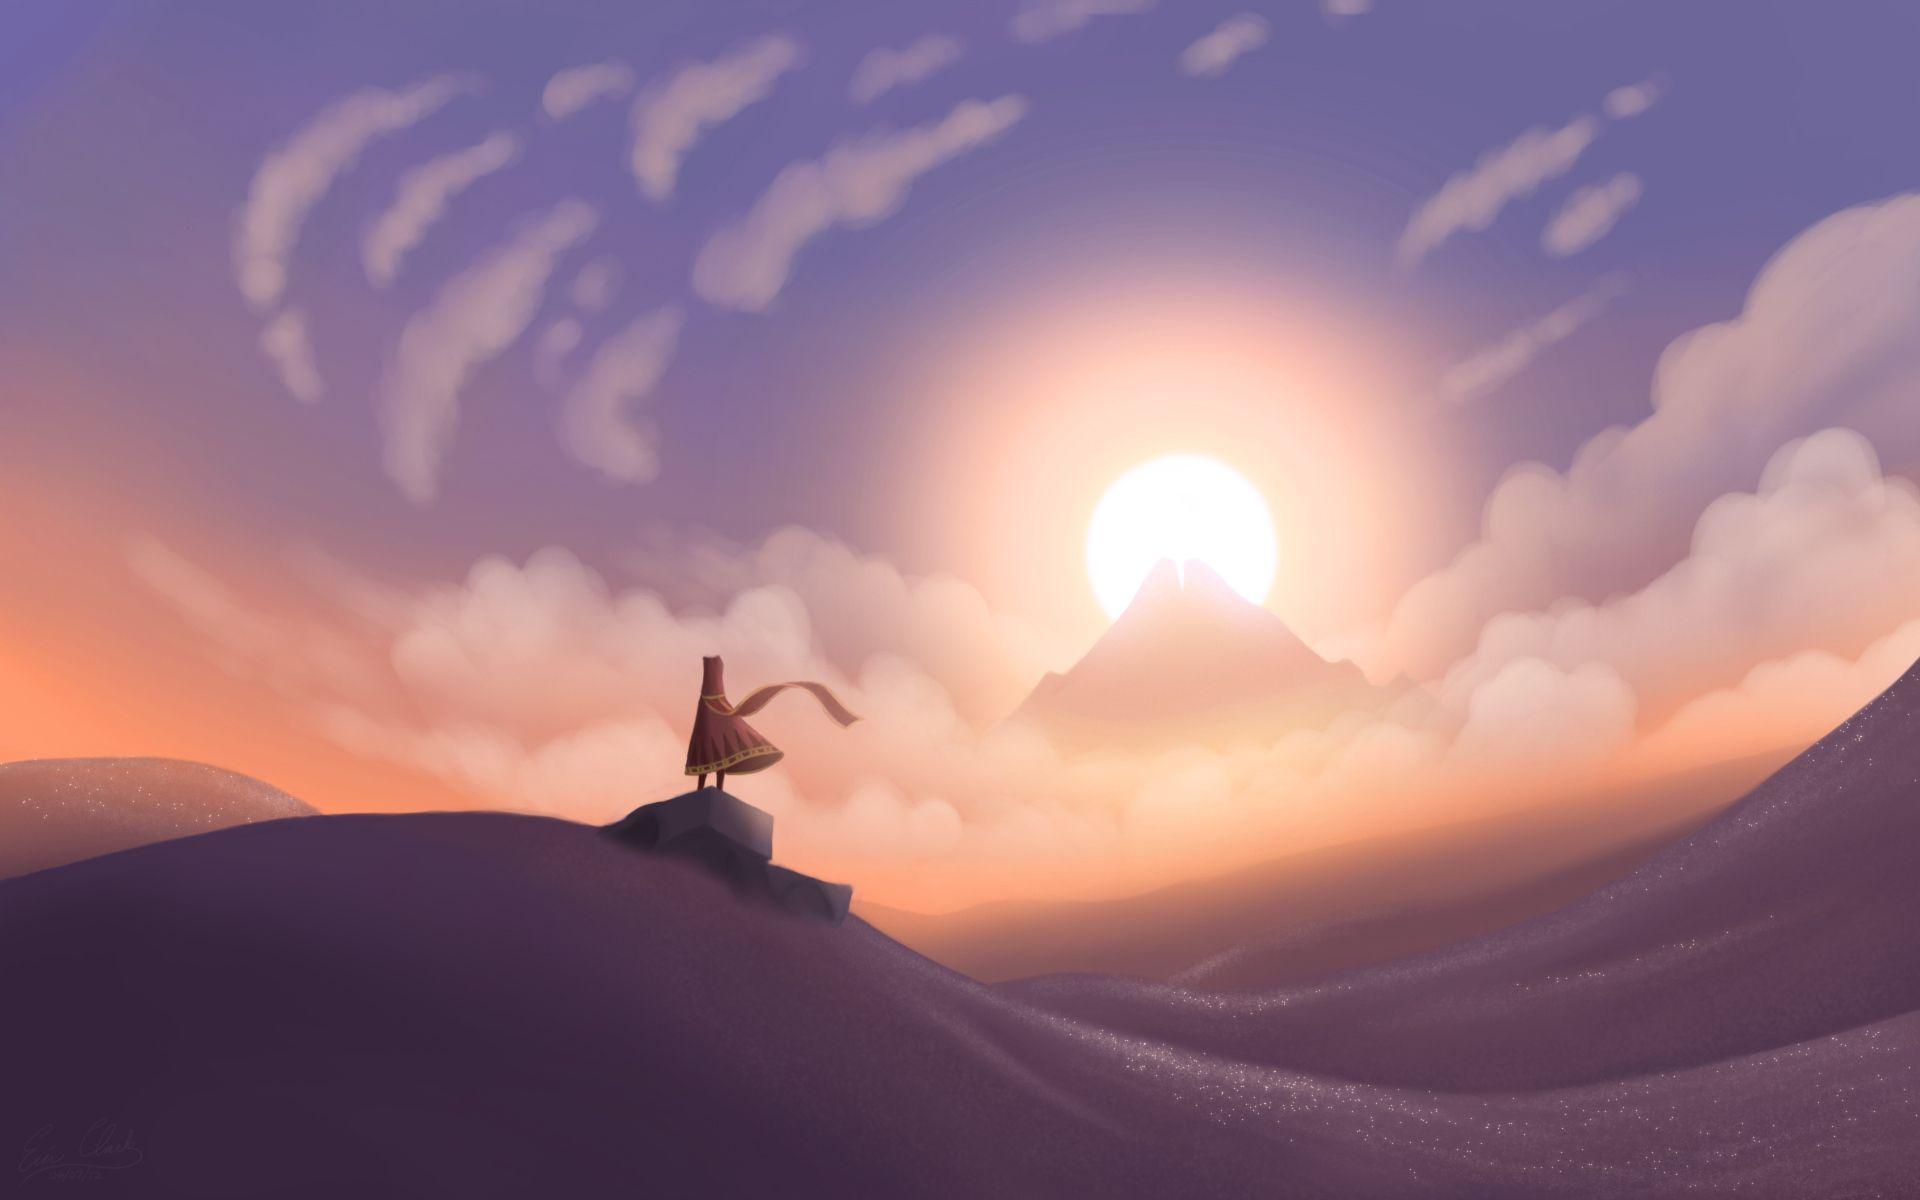 Journey Sunset by sawuinhaff.deviantart.com on @deviantART   Games journey,  Anime scenery, Fantasy landscape